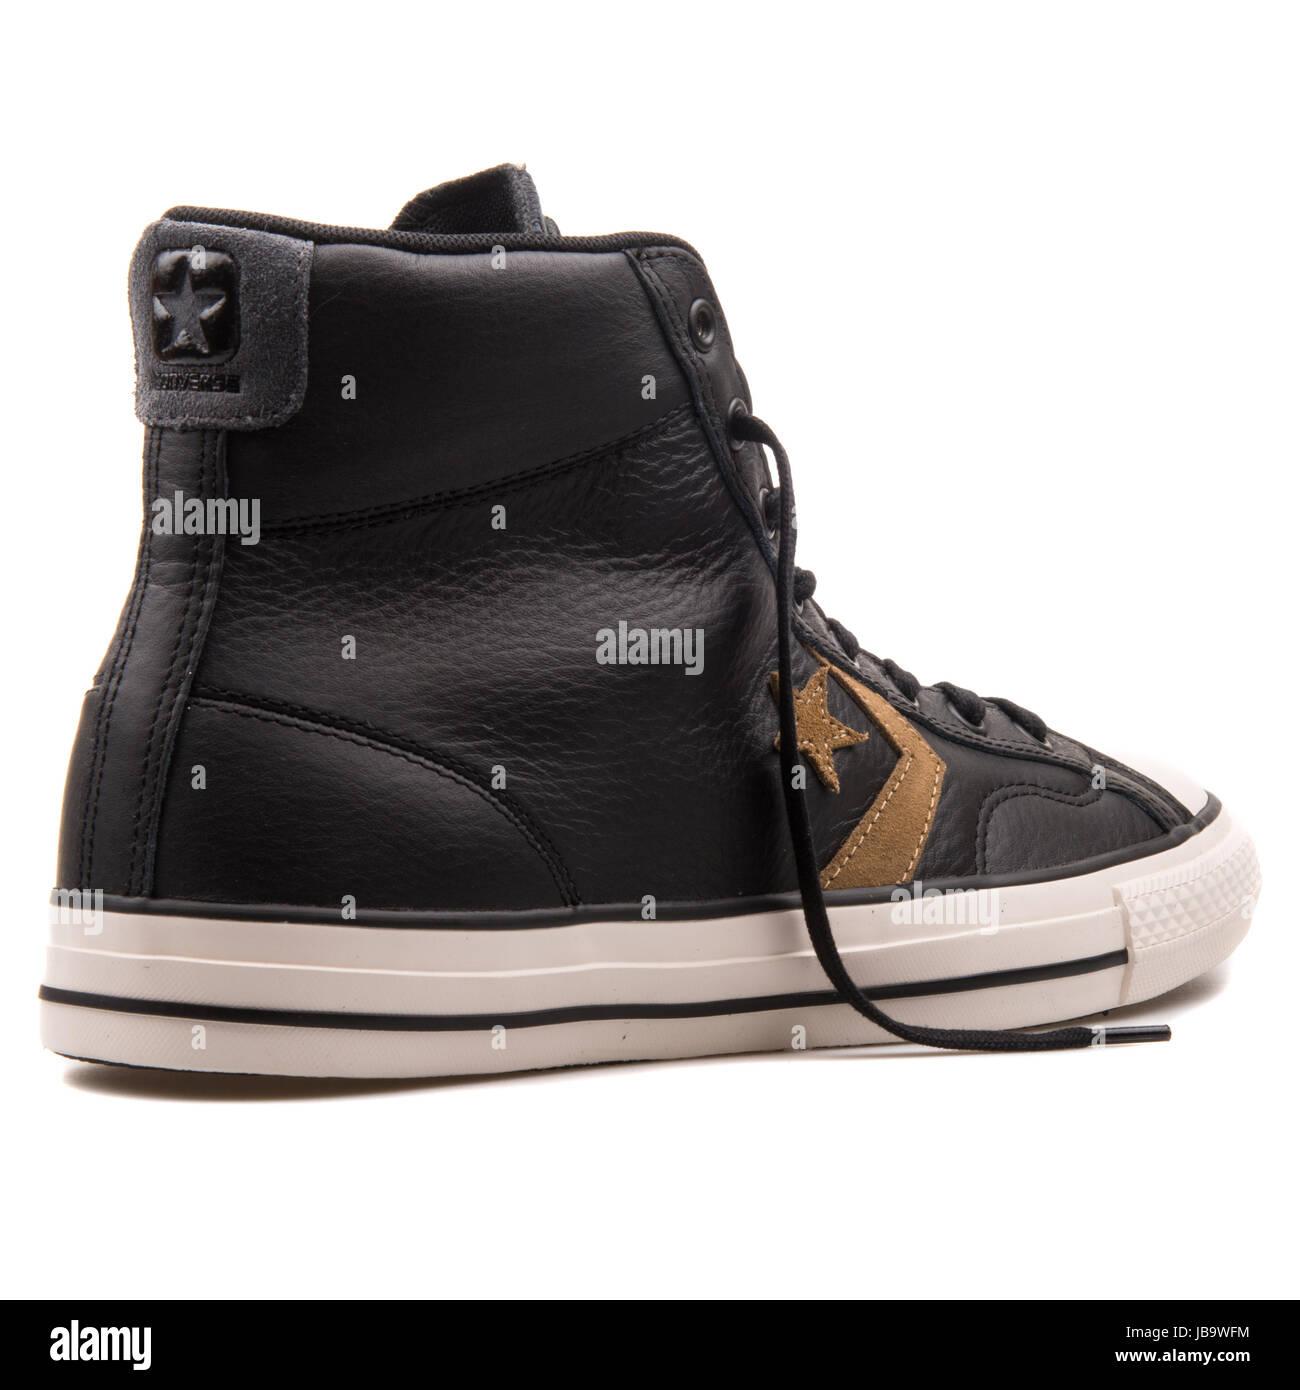 1d4e0eaeb84f Converse Chuck Taylor All Star Player Hi Black Sand Unisex Shoes - 149783C